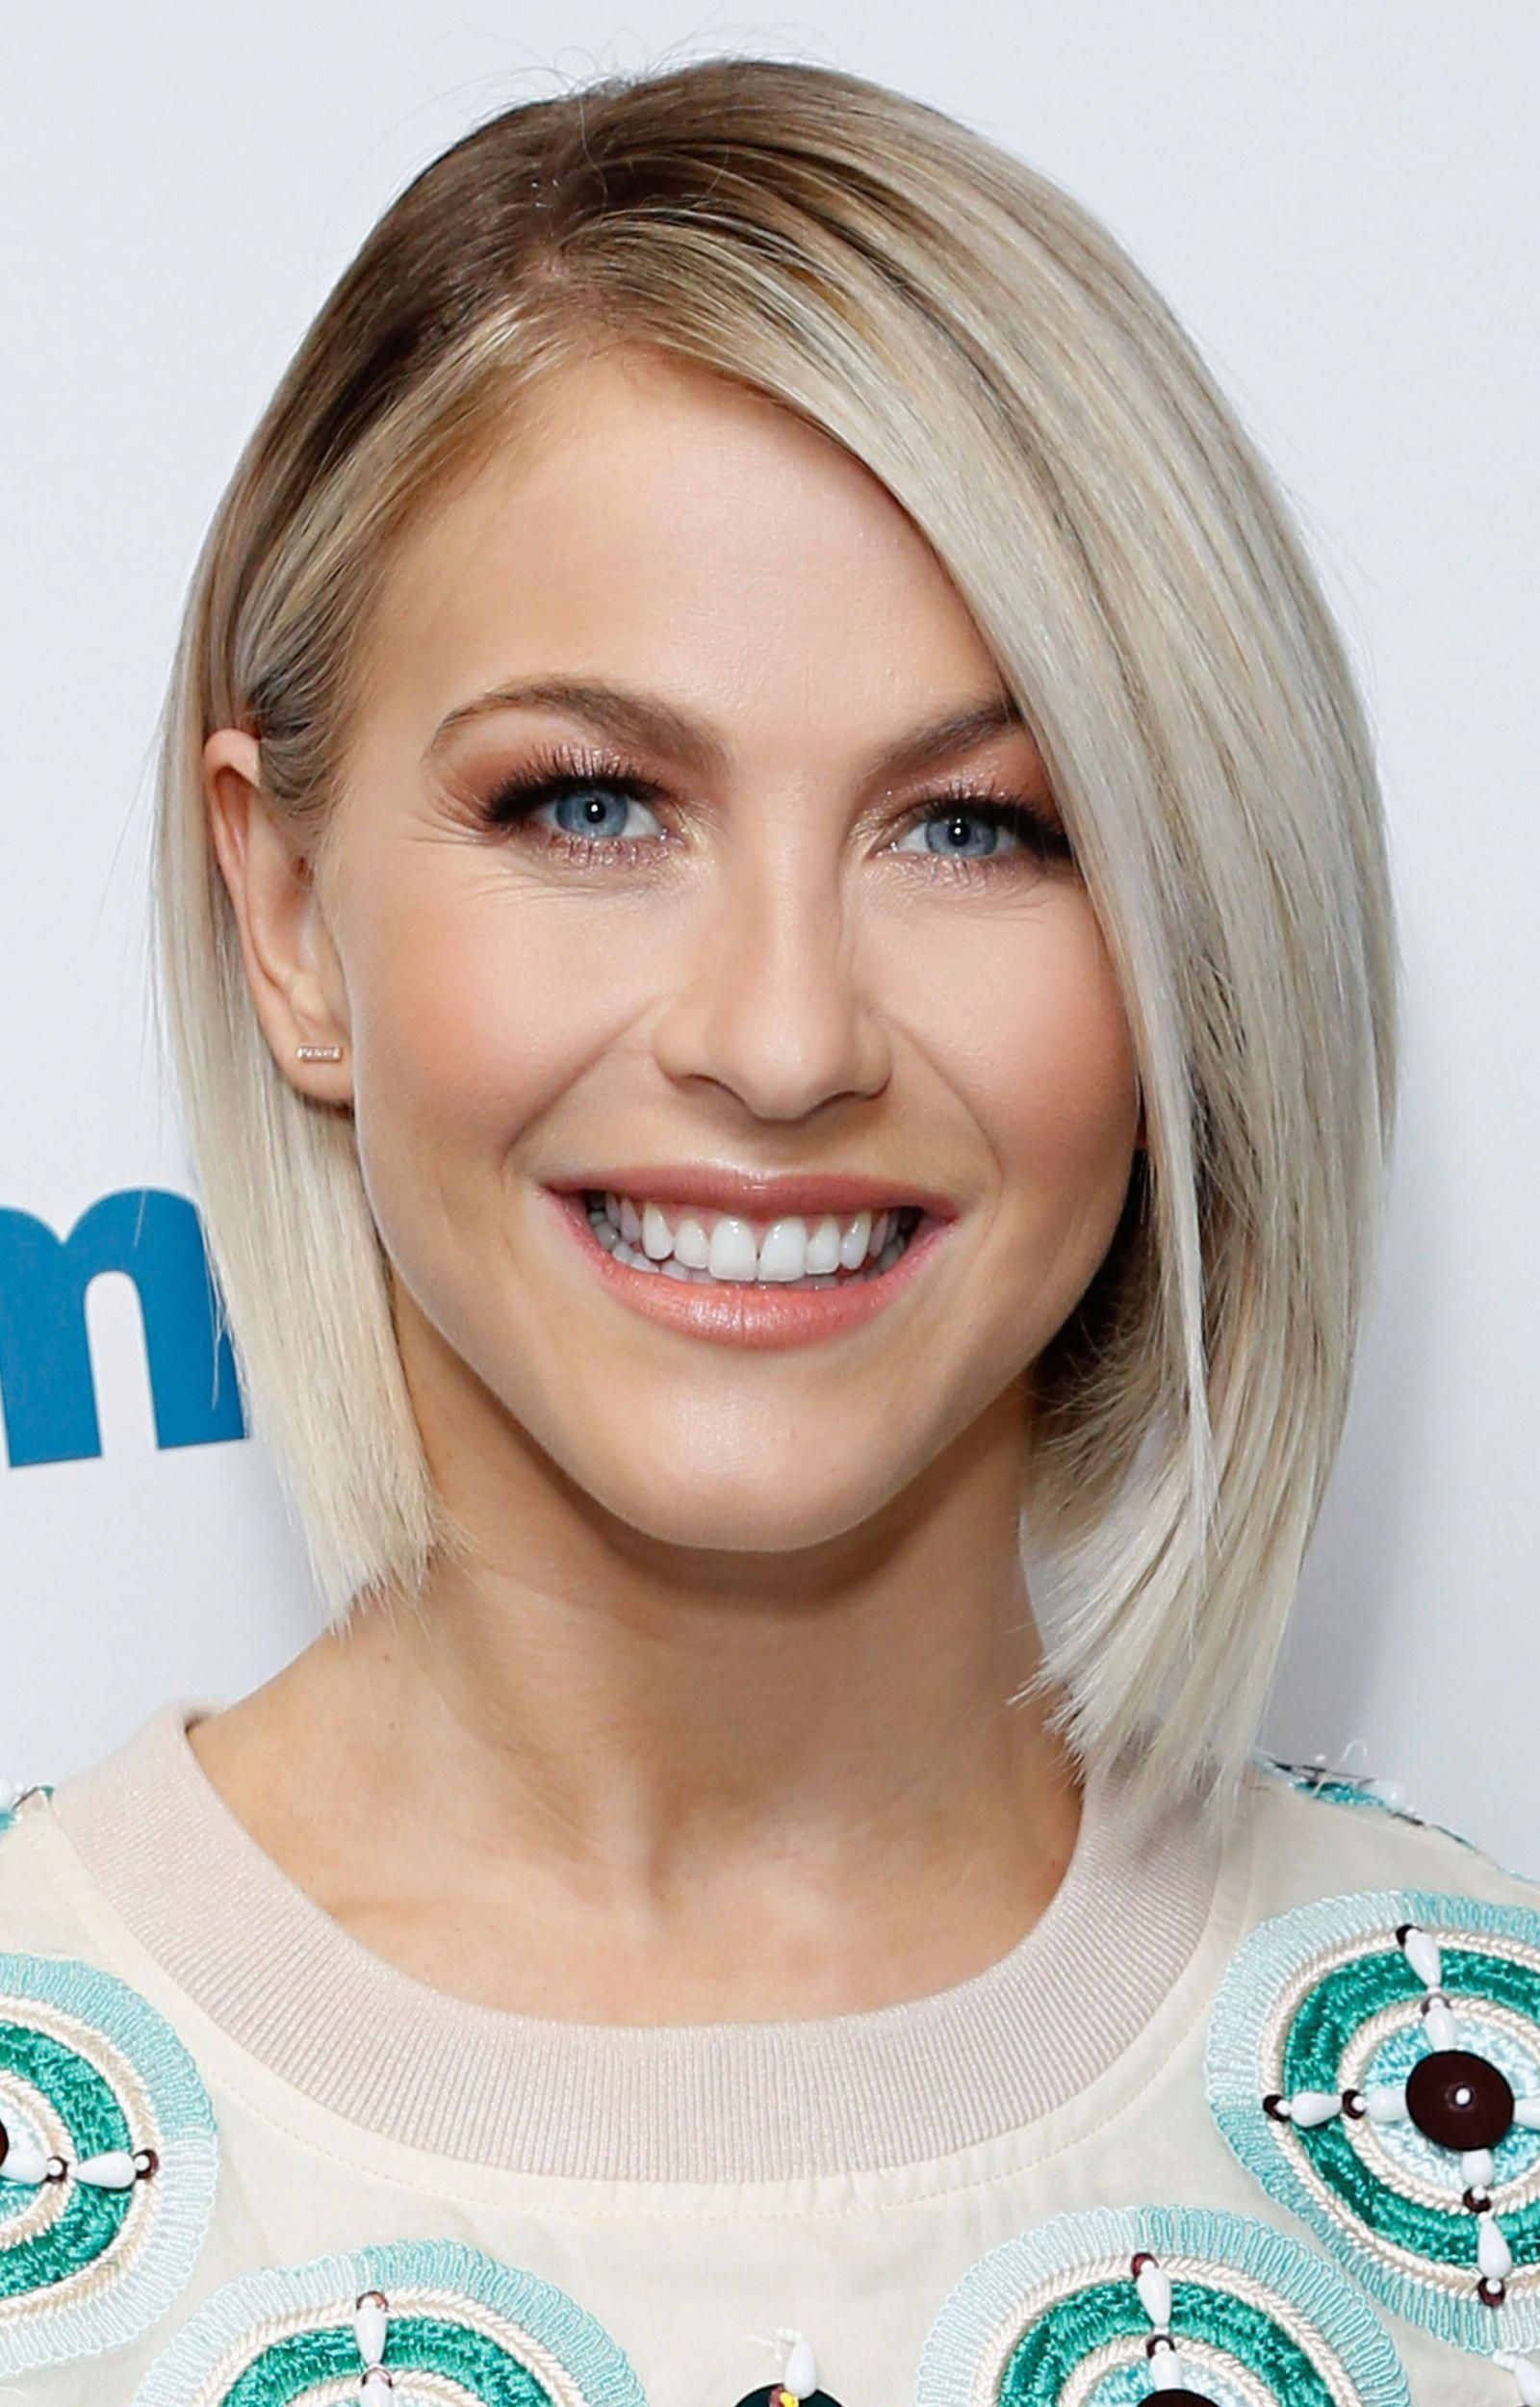 Pixie Haircut With Bangs | Haircut | Woman Style Hair 20190118 | Round face haircuts, Hairstyles ...